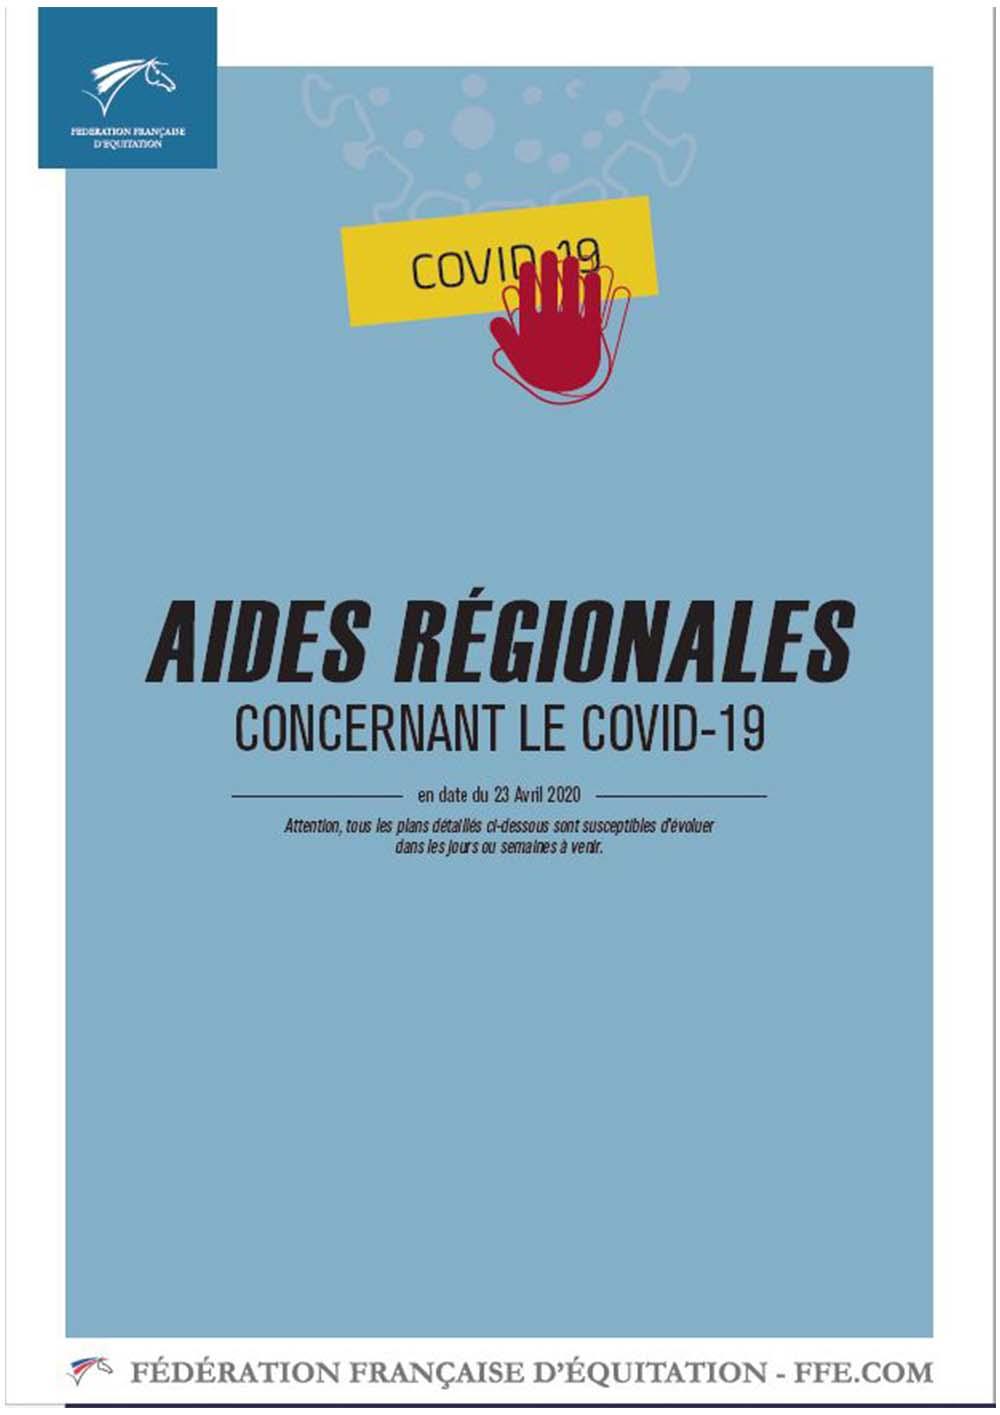 Covid19-Feedration francaise d'equitation